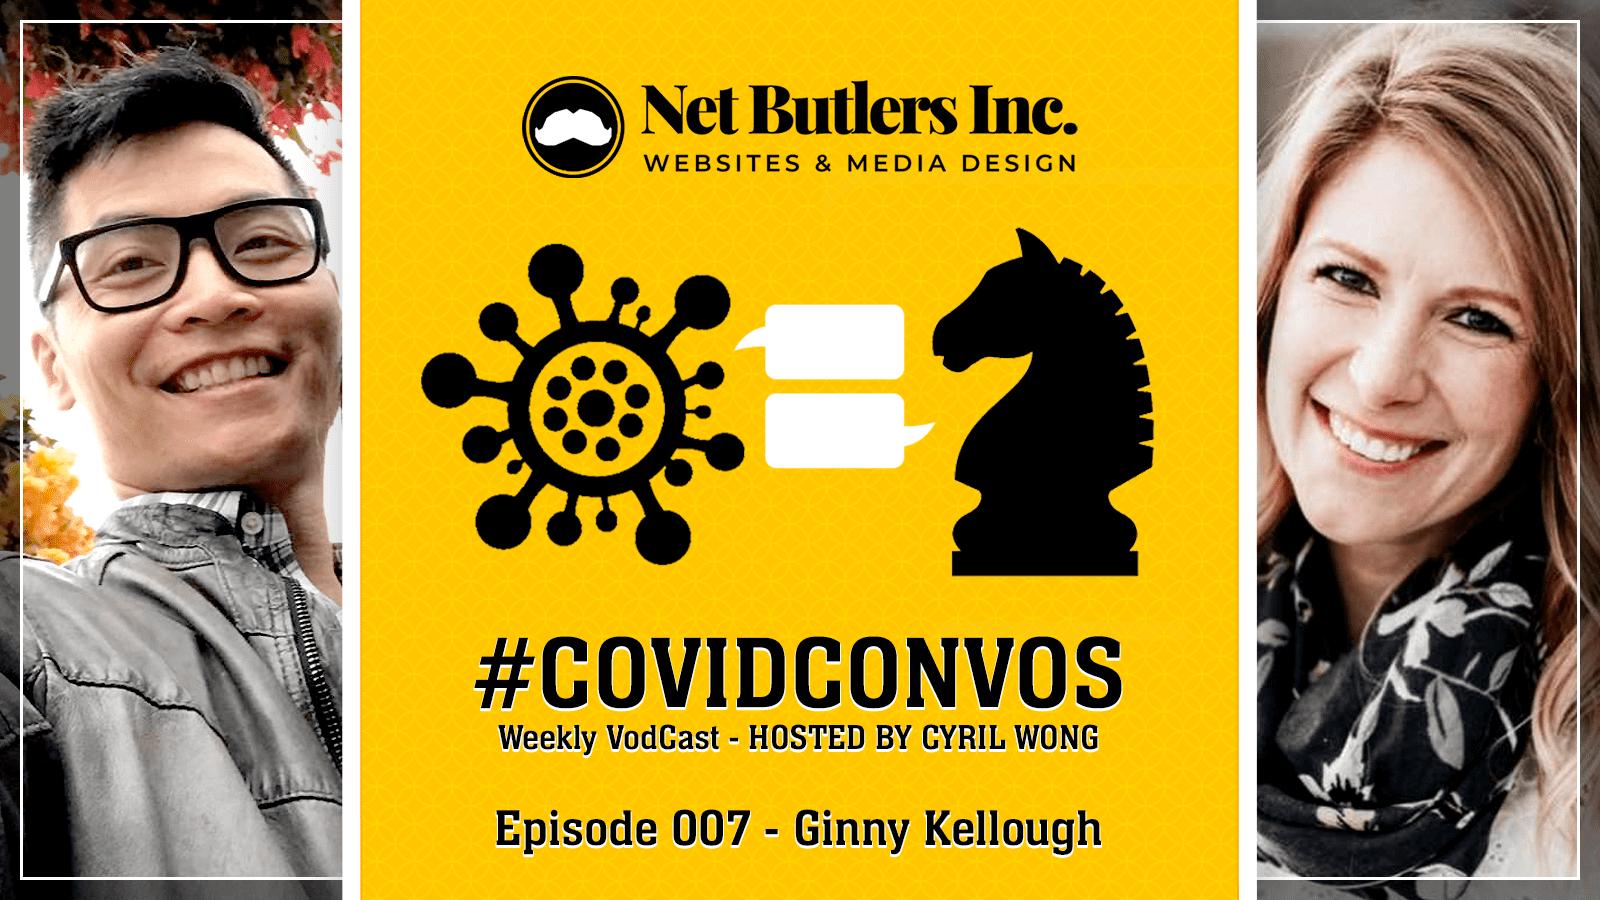 Ginny Kellough's Covid-19 Experience